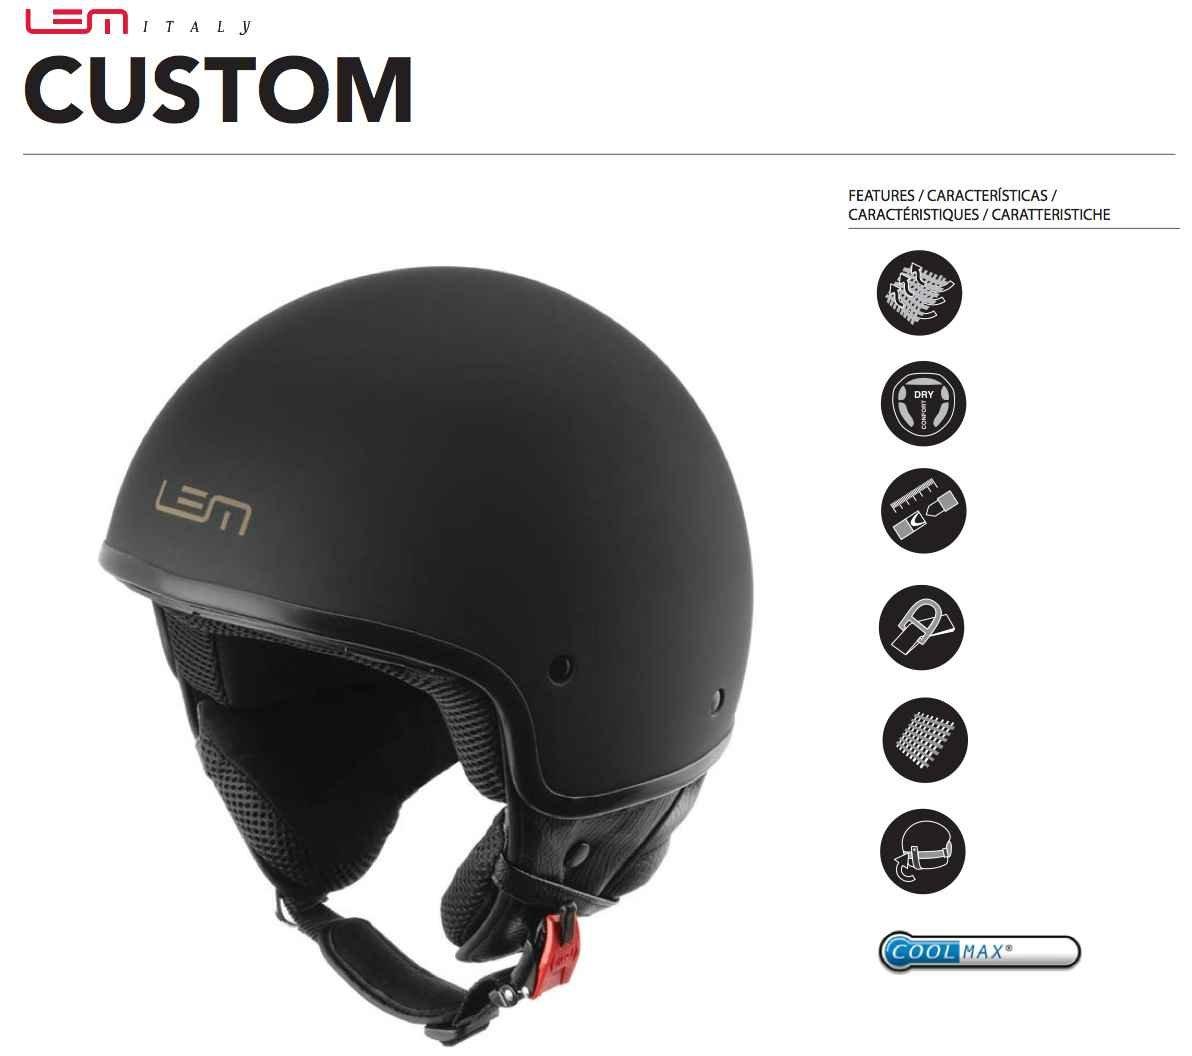 Amazon.es: Casco Moto LEM - Roger Custom Black Powder, NEGRO ...